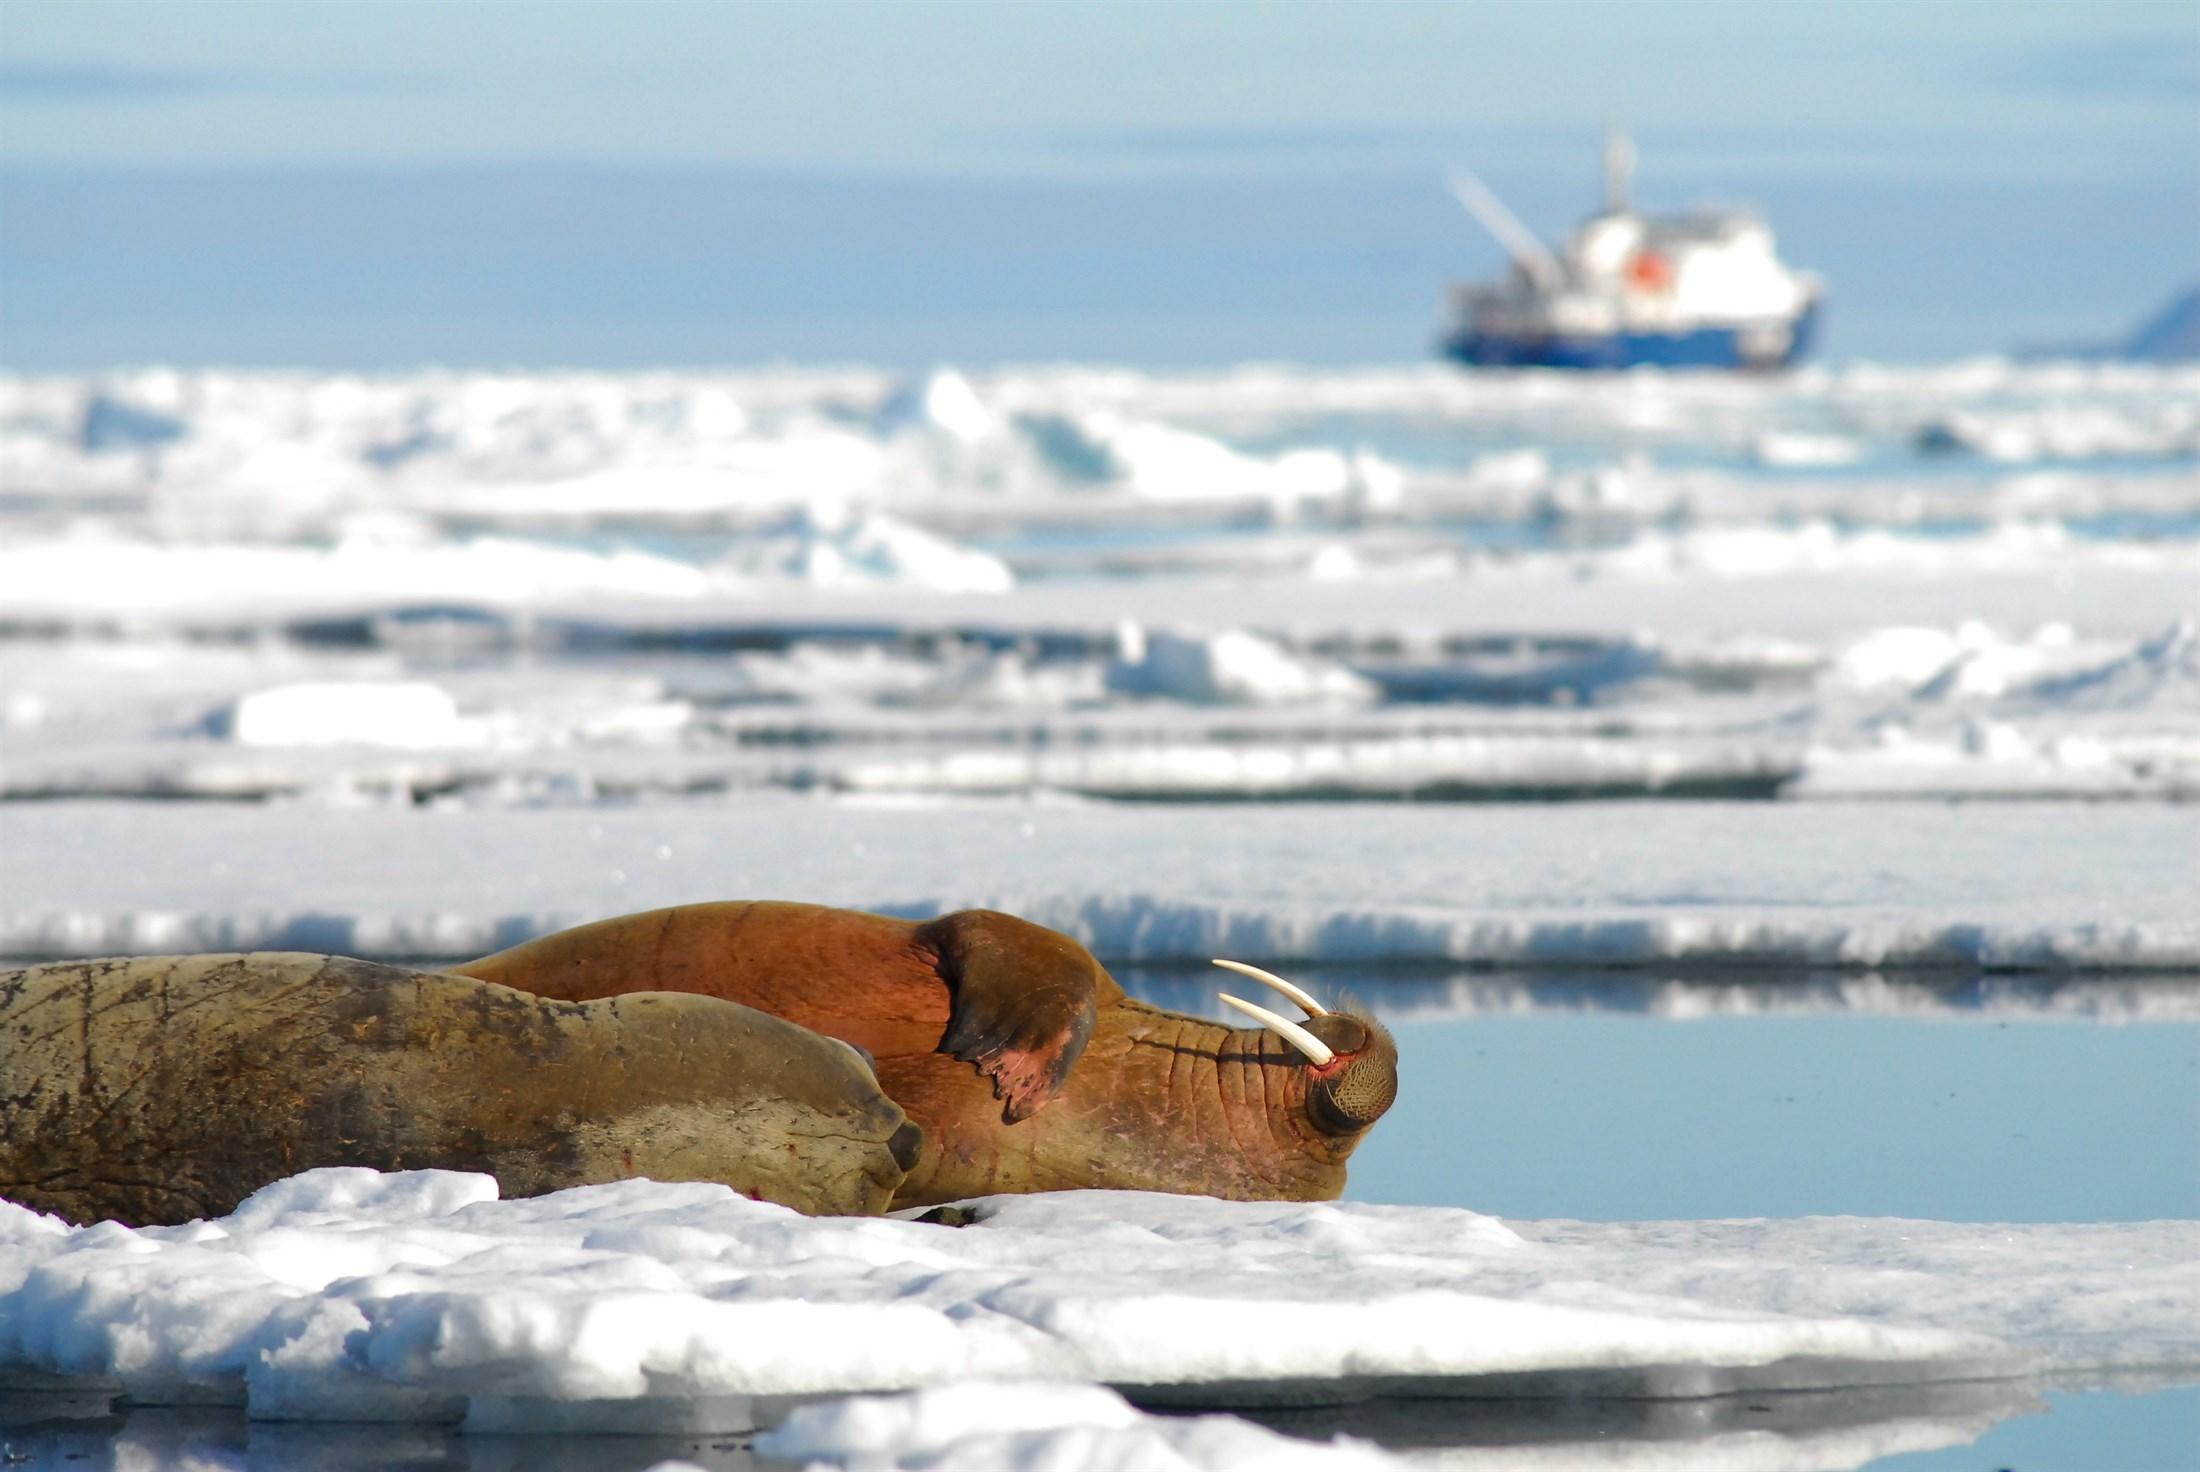 walrus-odobenus-rosmarus-svalbard_b5ee-2200x1472px